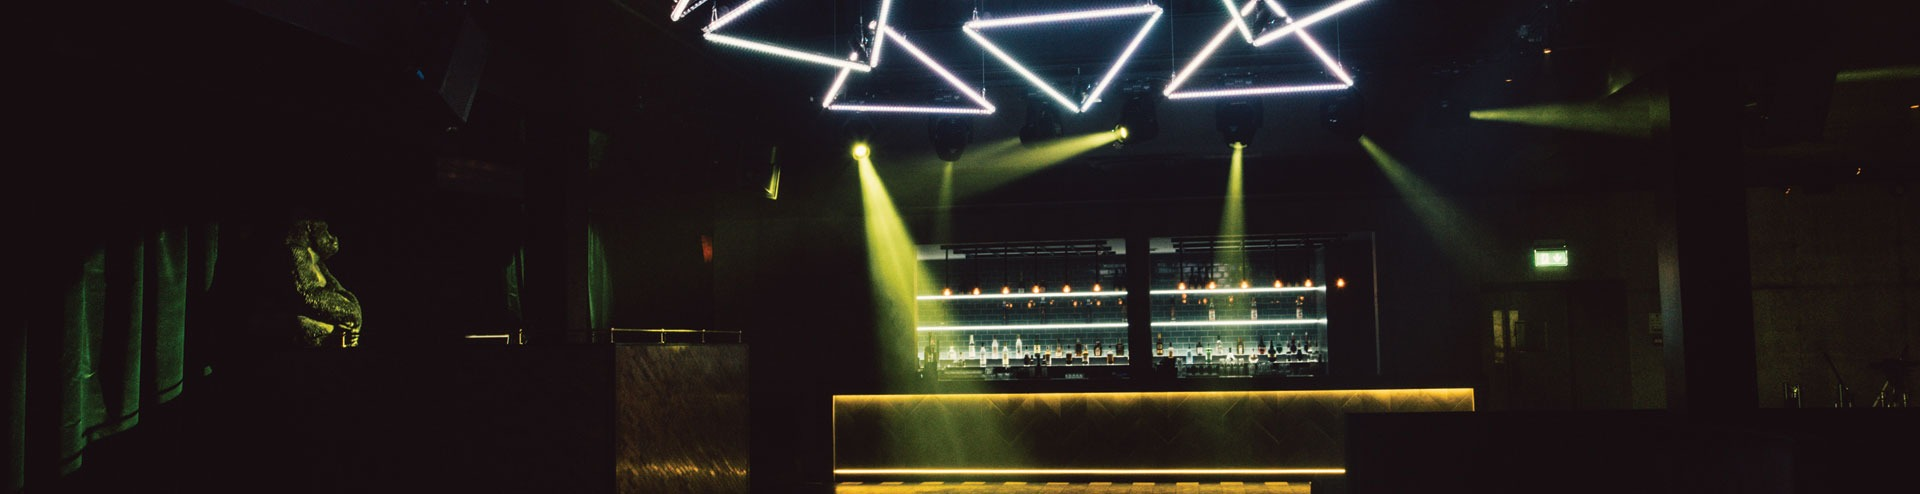 Architectural-lighting-Alibi